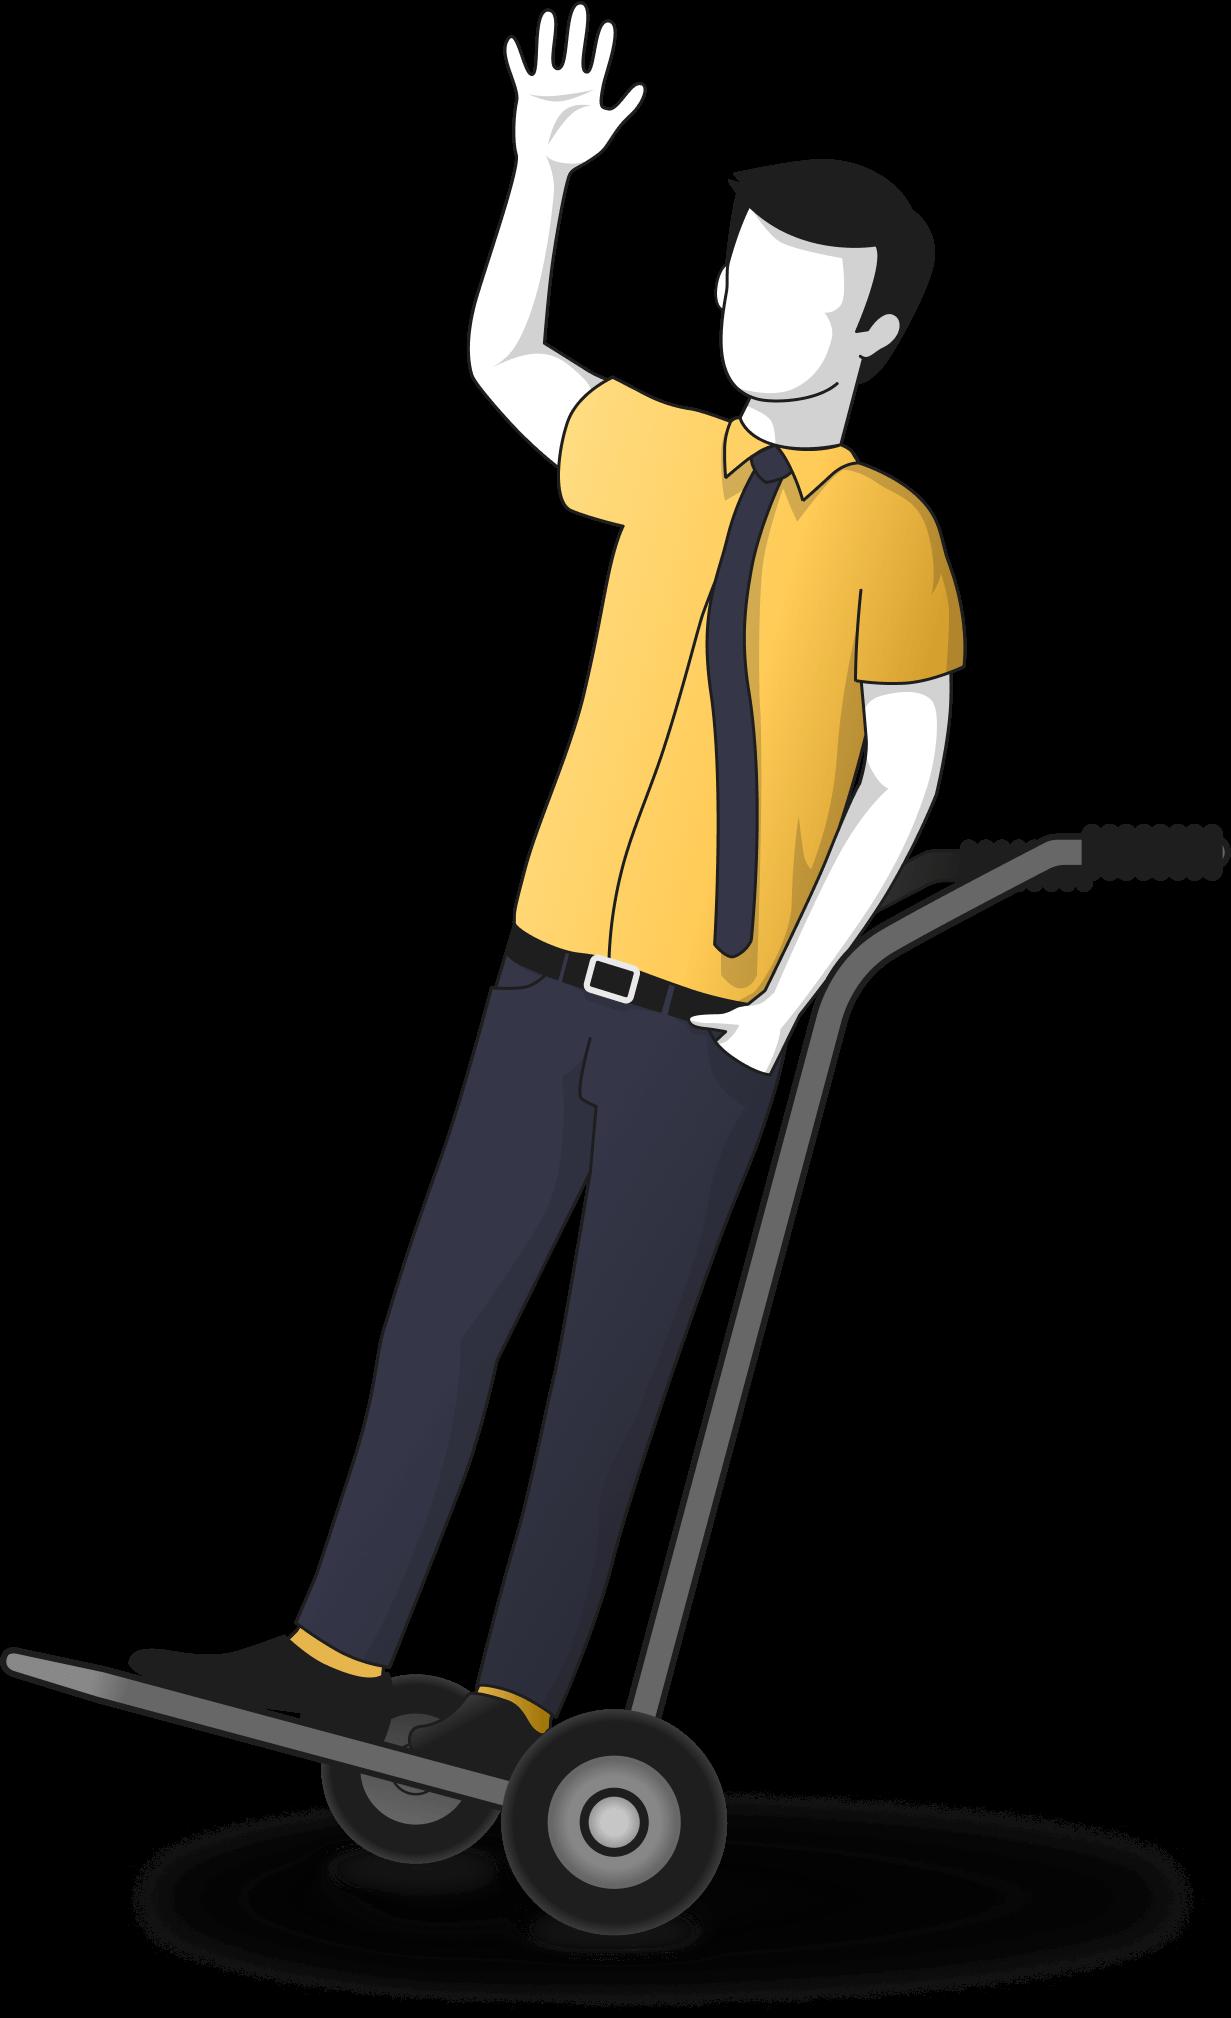 CTO as a Wervice hero image